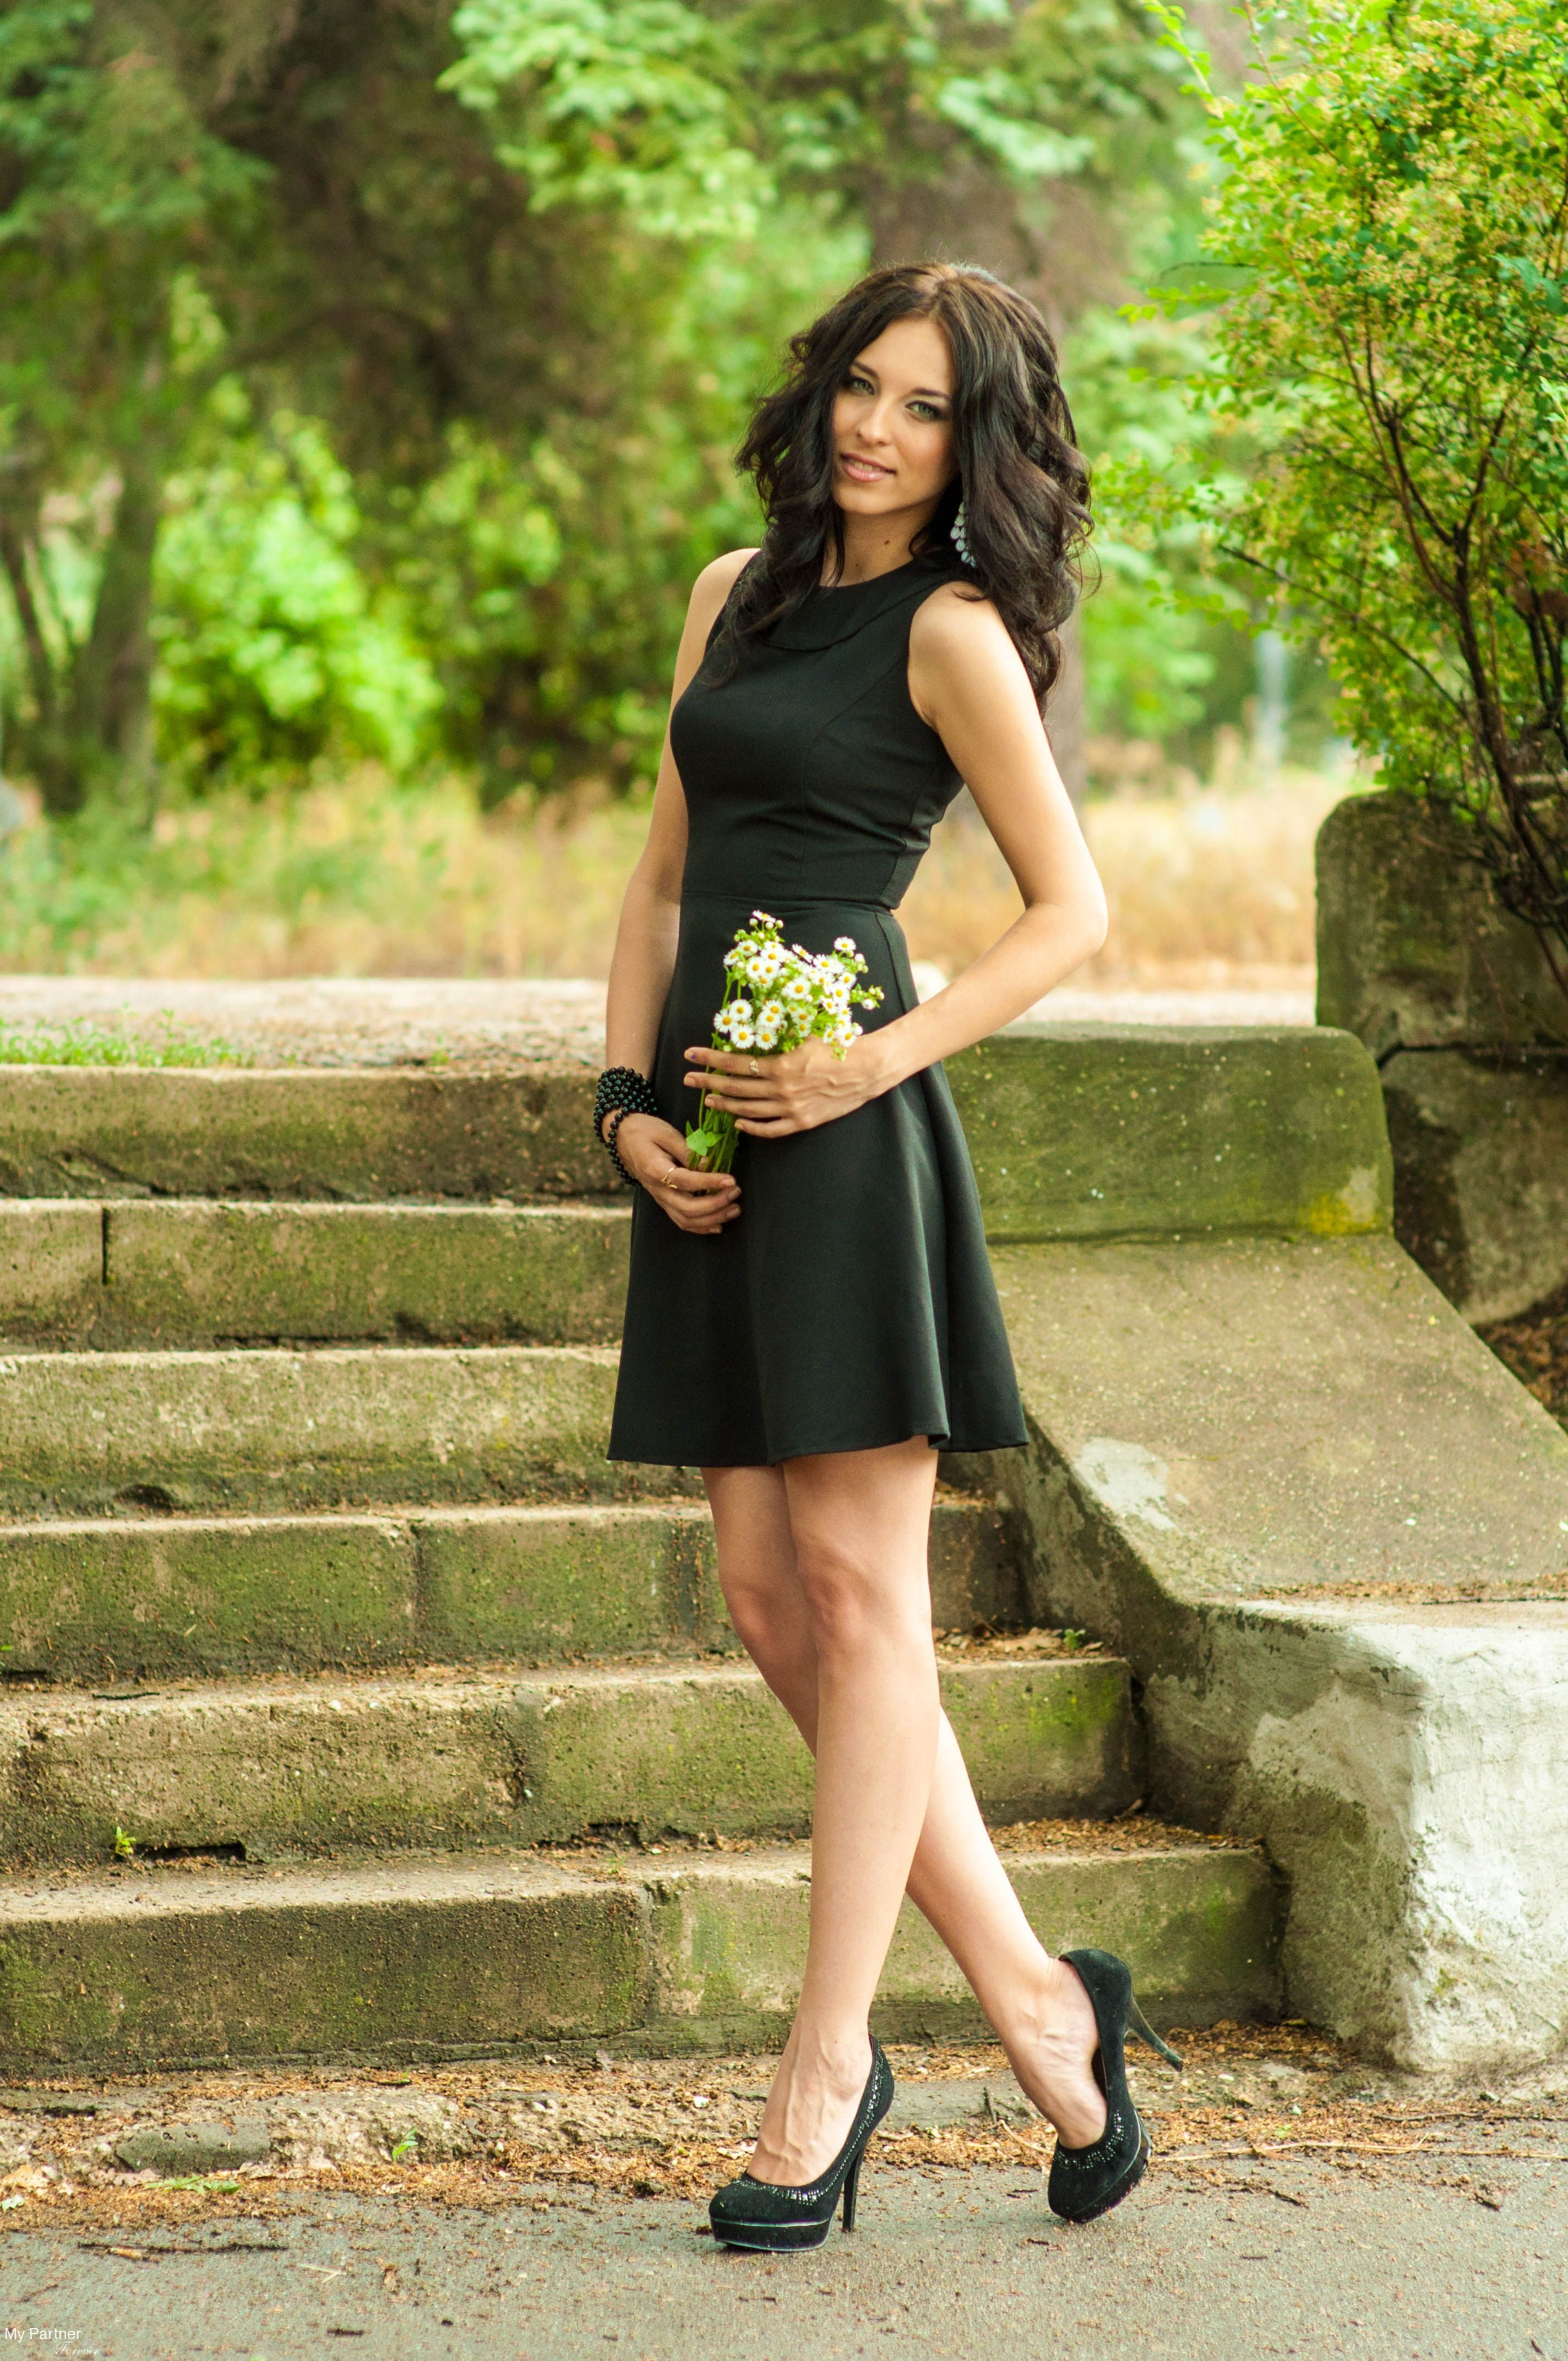 Oksana russian dating free online Russian mail order